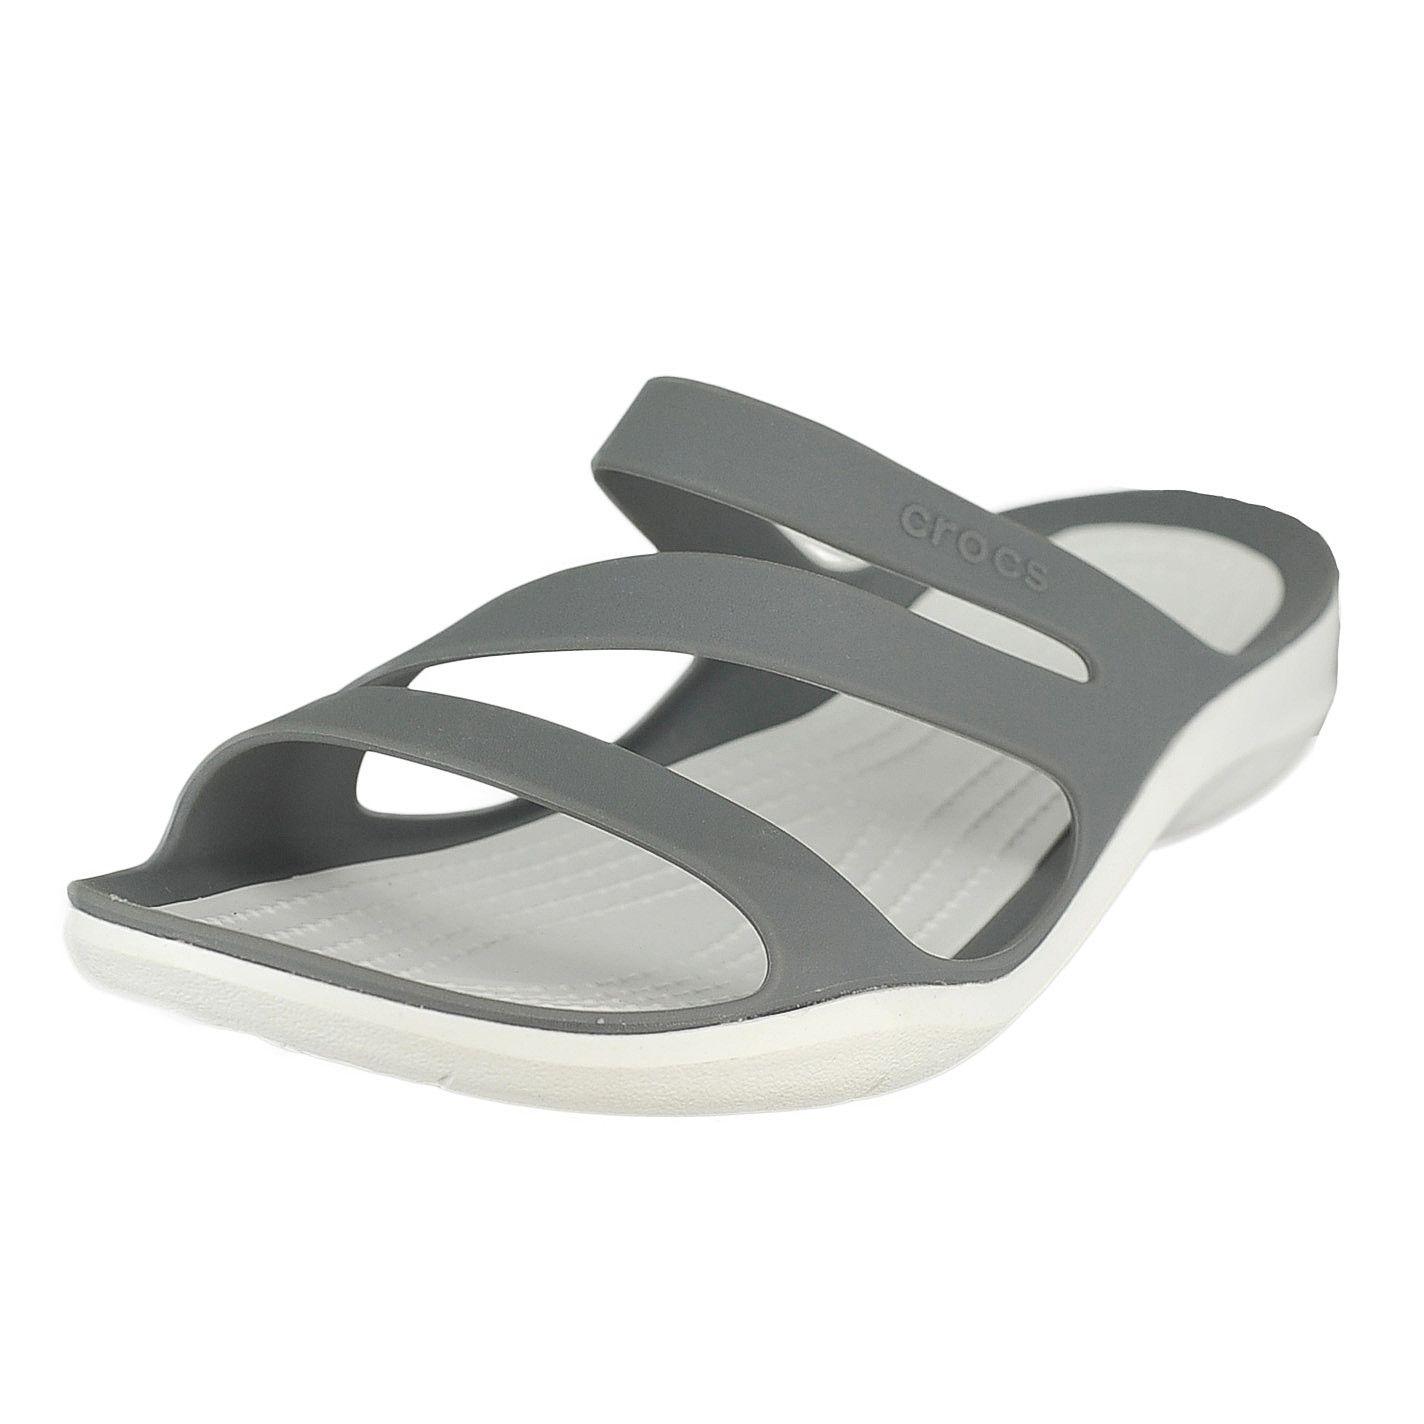 Crocs Women S Swiftwater Sandal Sandals Crocs Swiftwater